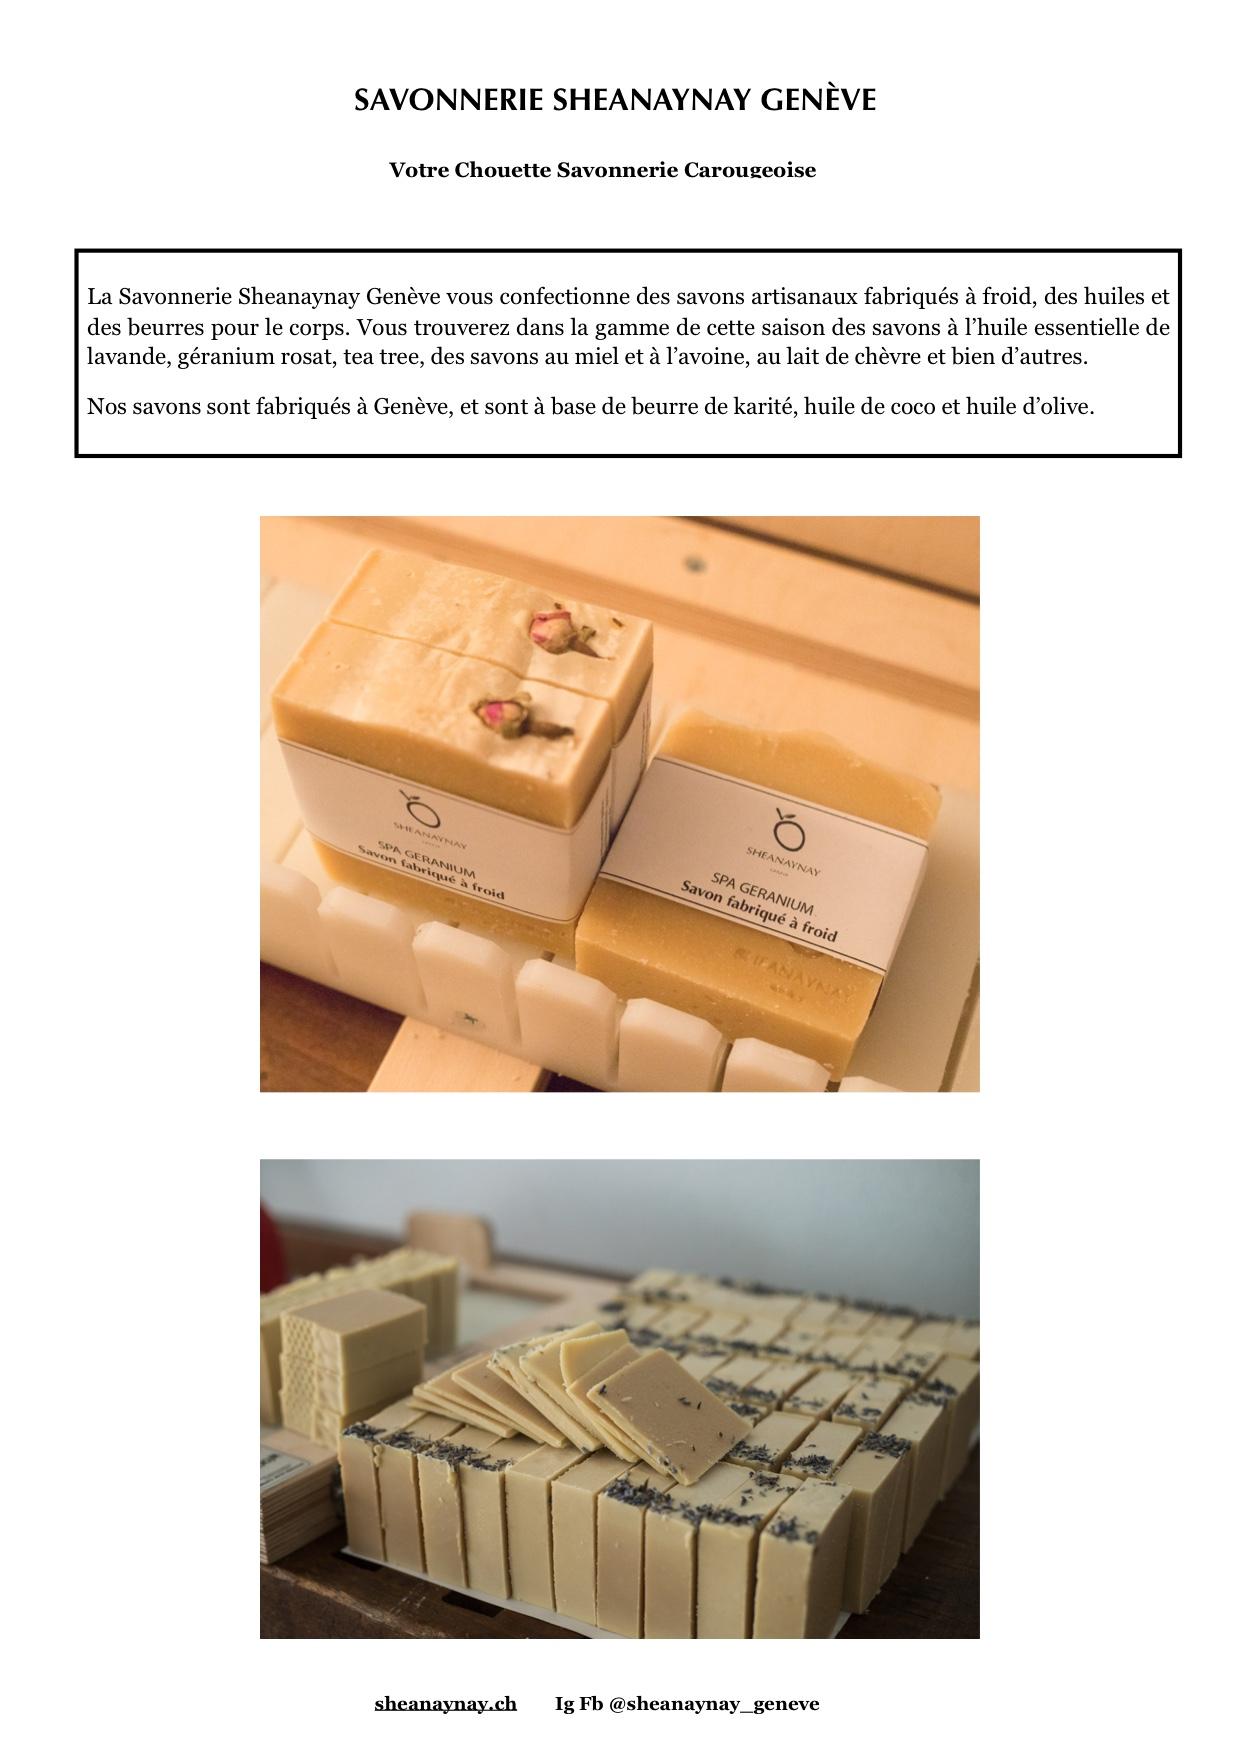 Kwame Okyere - Sheanaynay Genève, savonnerie artisanale